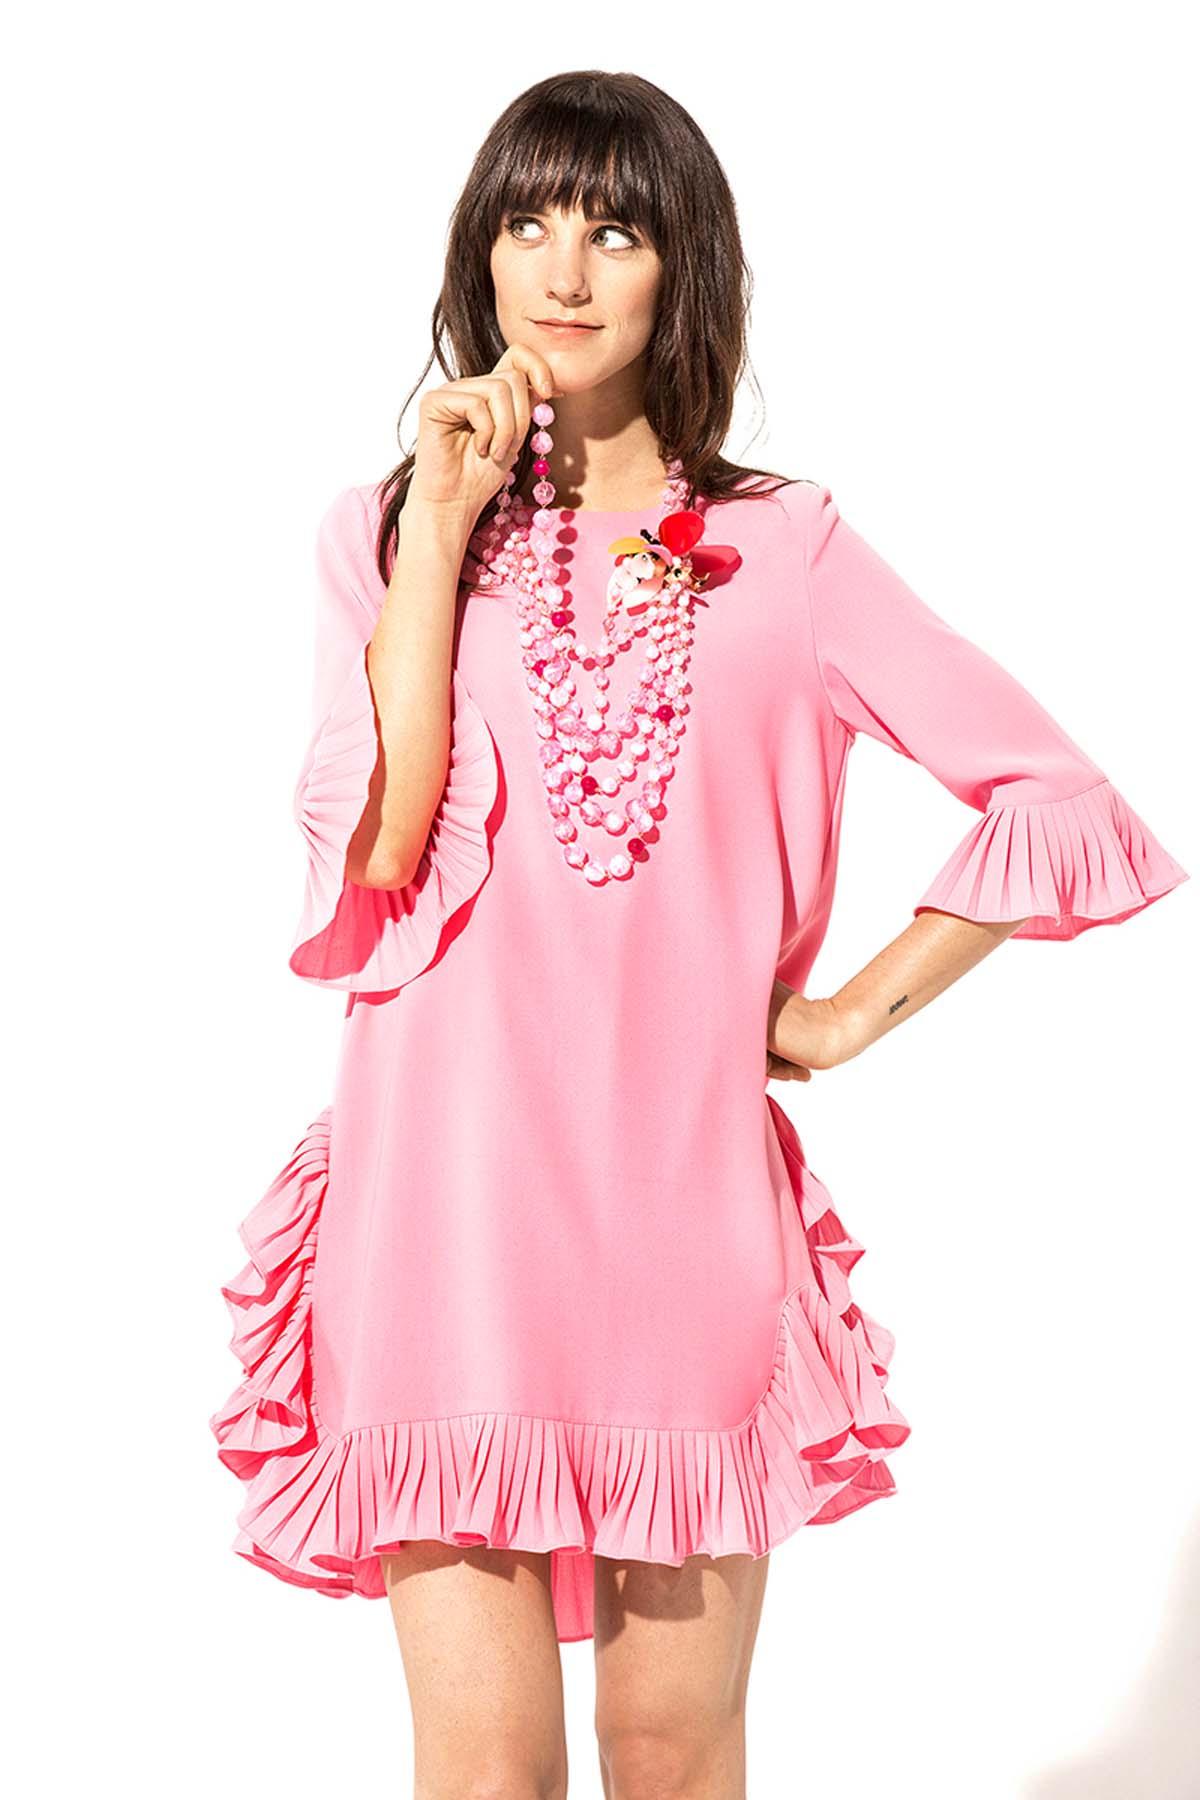 Vestidos TERIA YABAR | Primavera Verano 2018